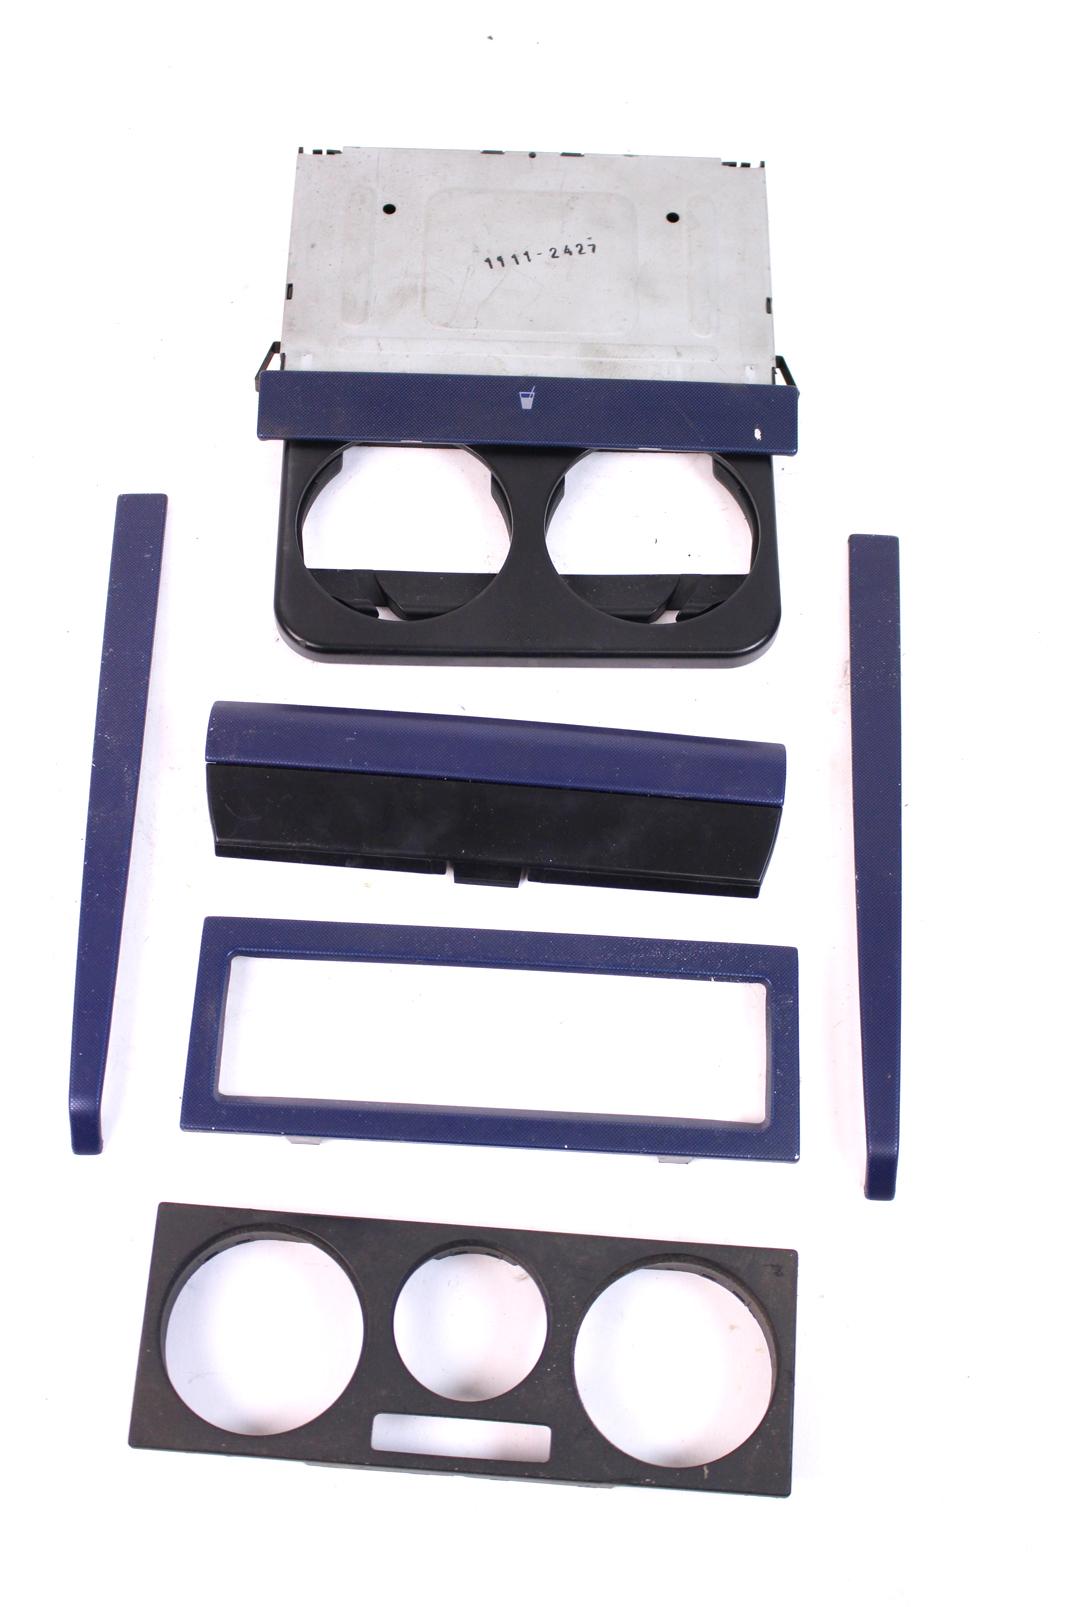 mittelkonsole vw golf iv 4 bora blau getr nkehalter din. Black Bedroom Furniture Sets. Home Design Ideas